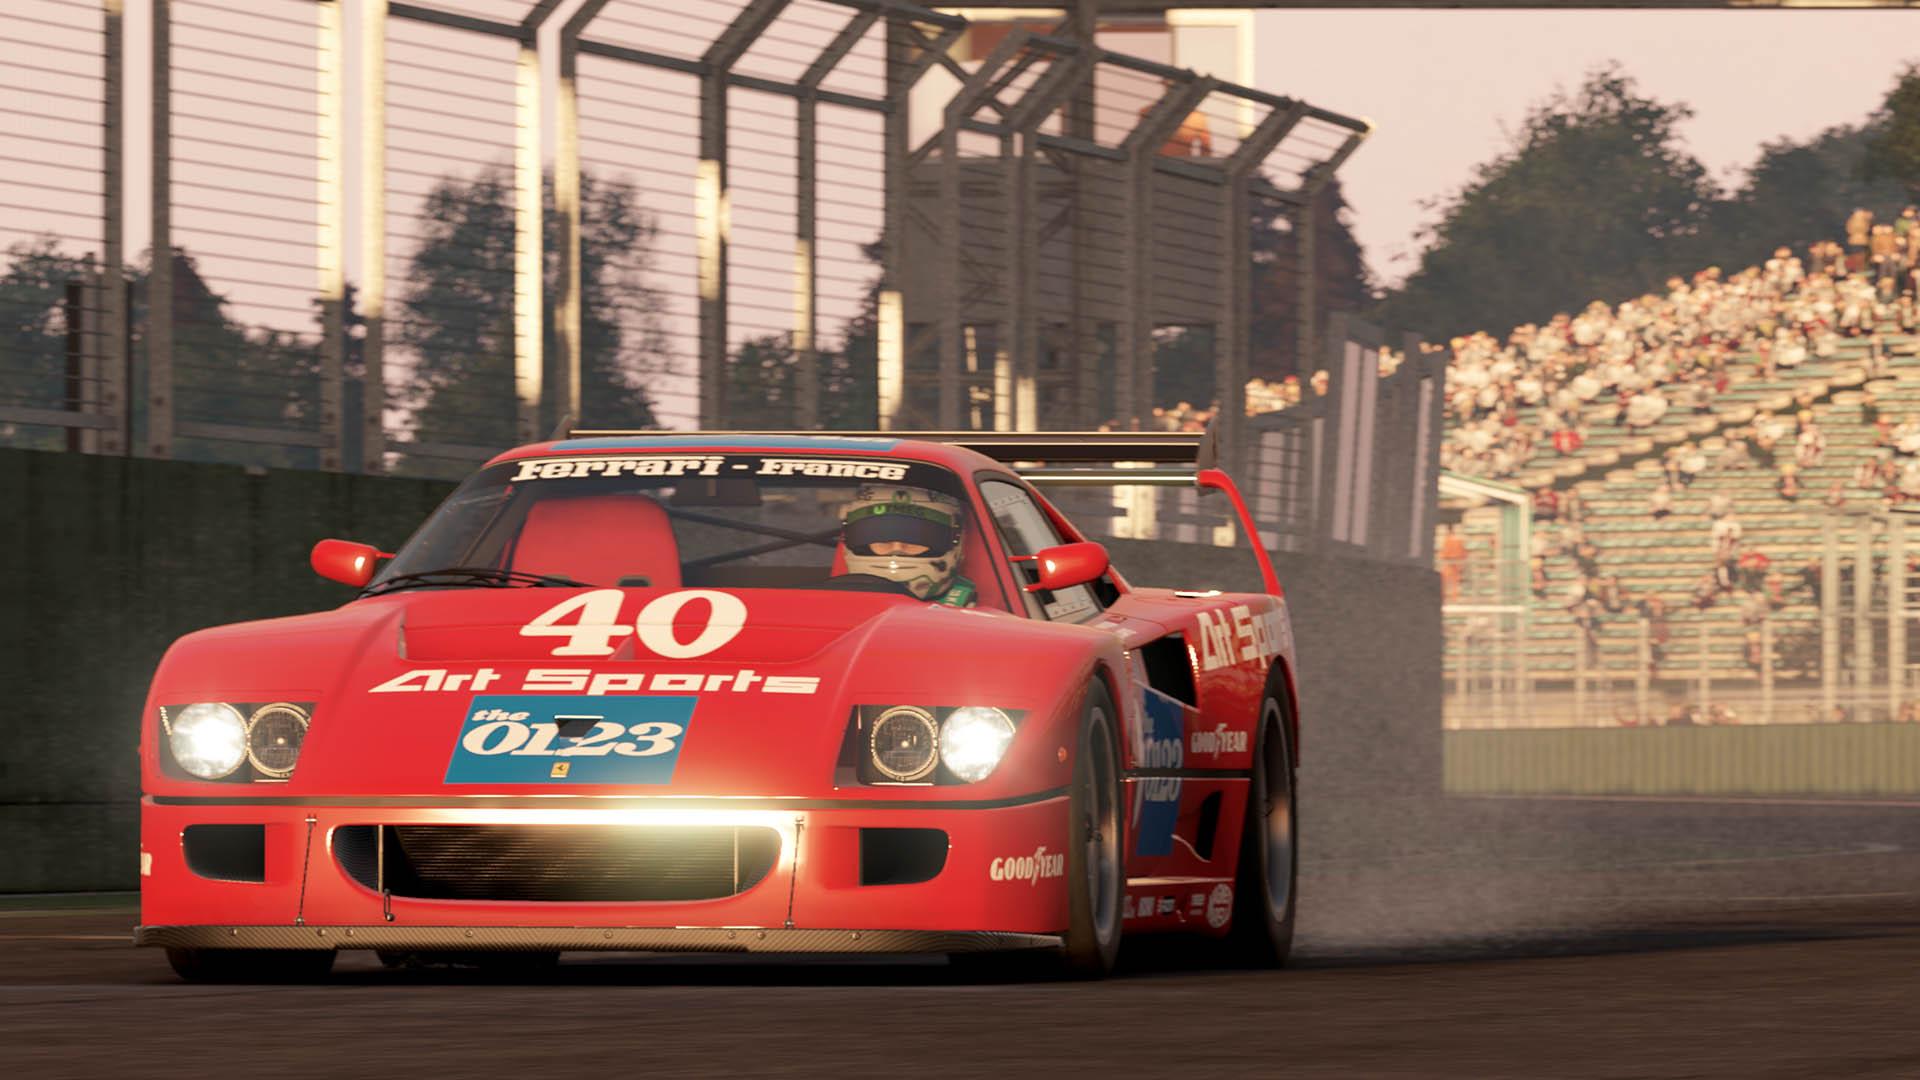 Ferrari Full Hd Wallpaper Project Cars 2 Voit Du Rouge Avec Son Trailer 4k Et Les